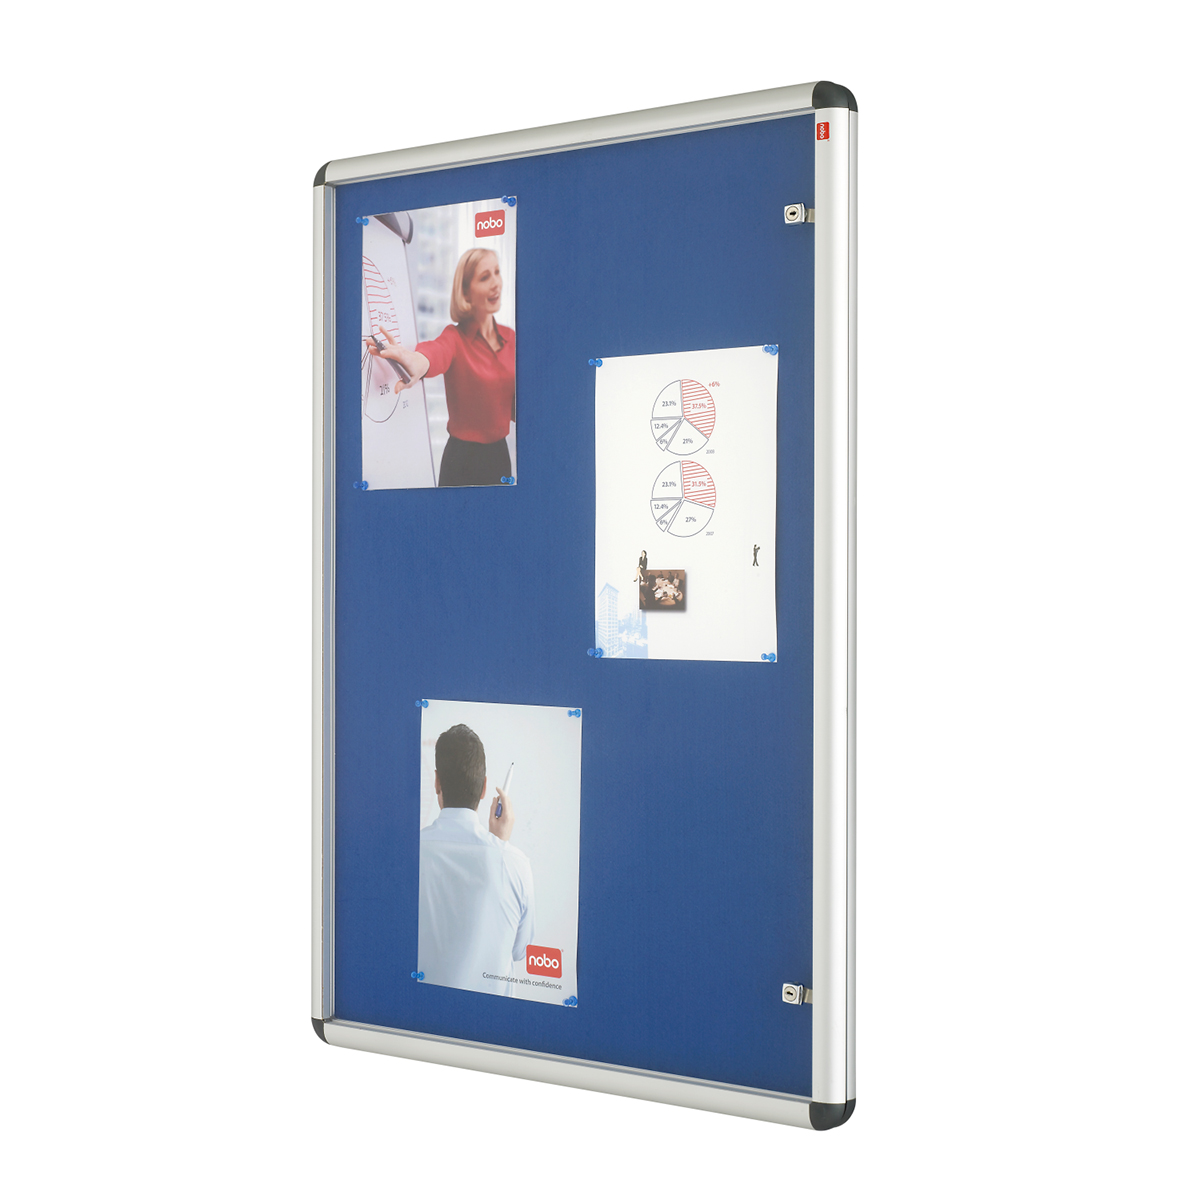 Nobo 1902049 A0 Internal Display Case with Blue Felt